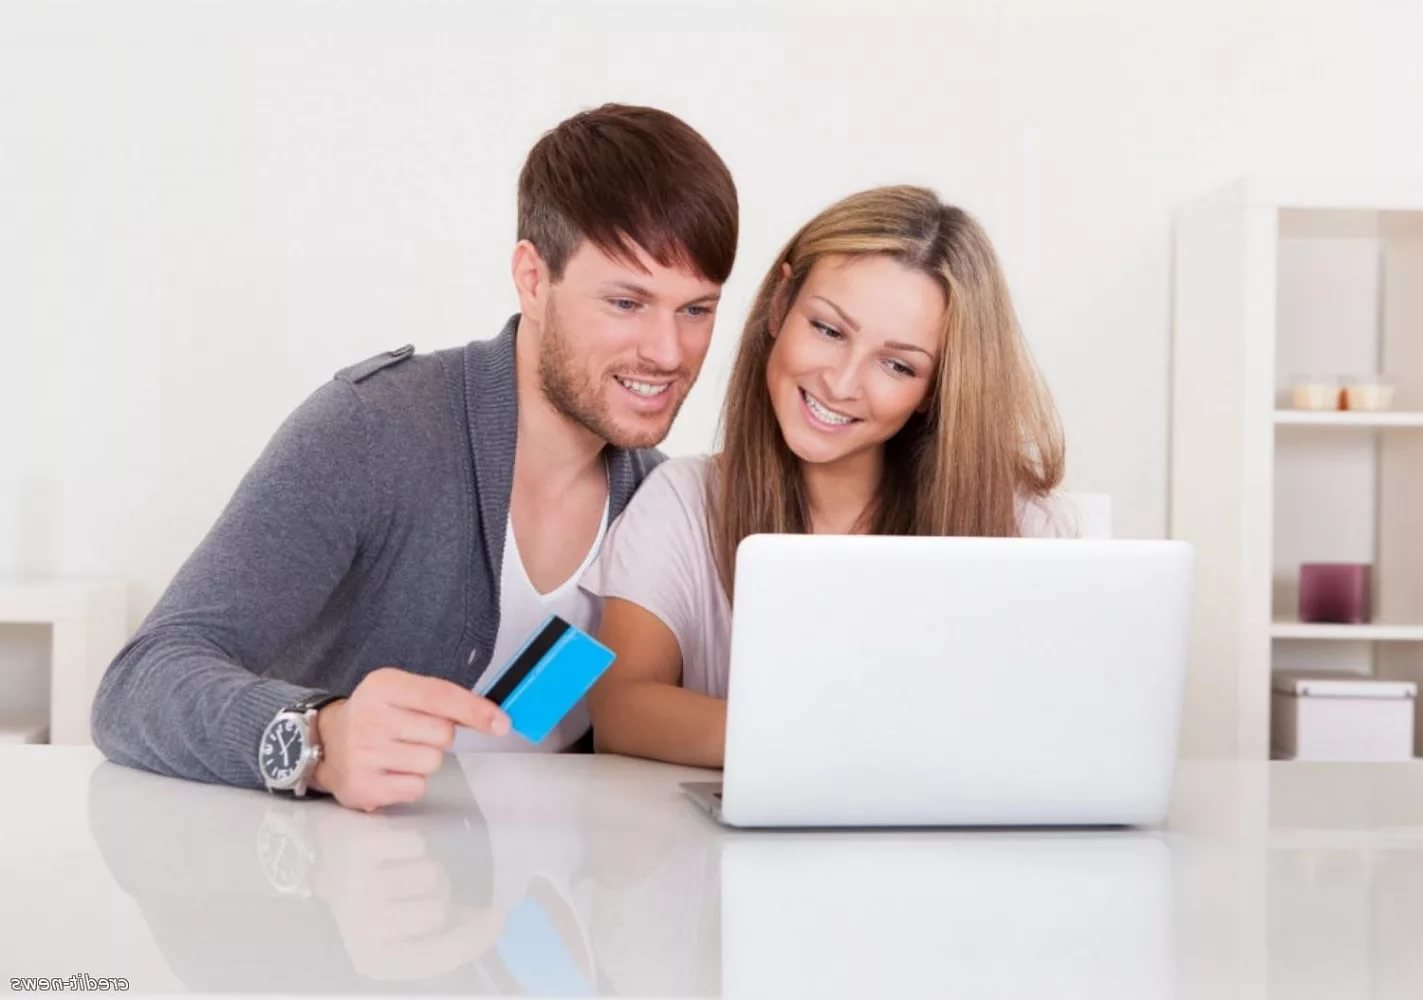 Кредит онлайн лучшие банки